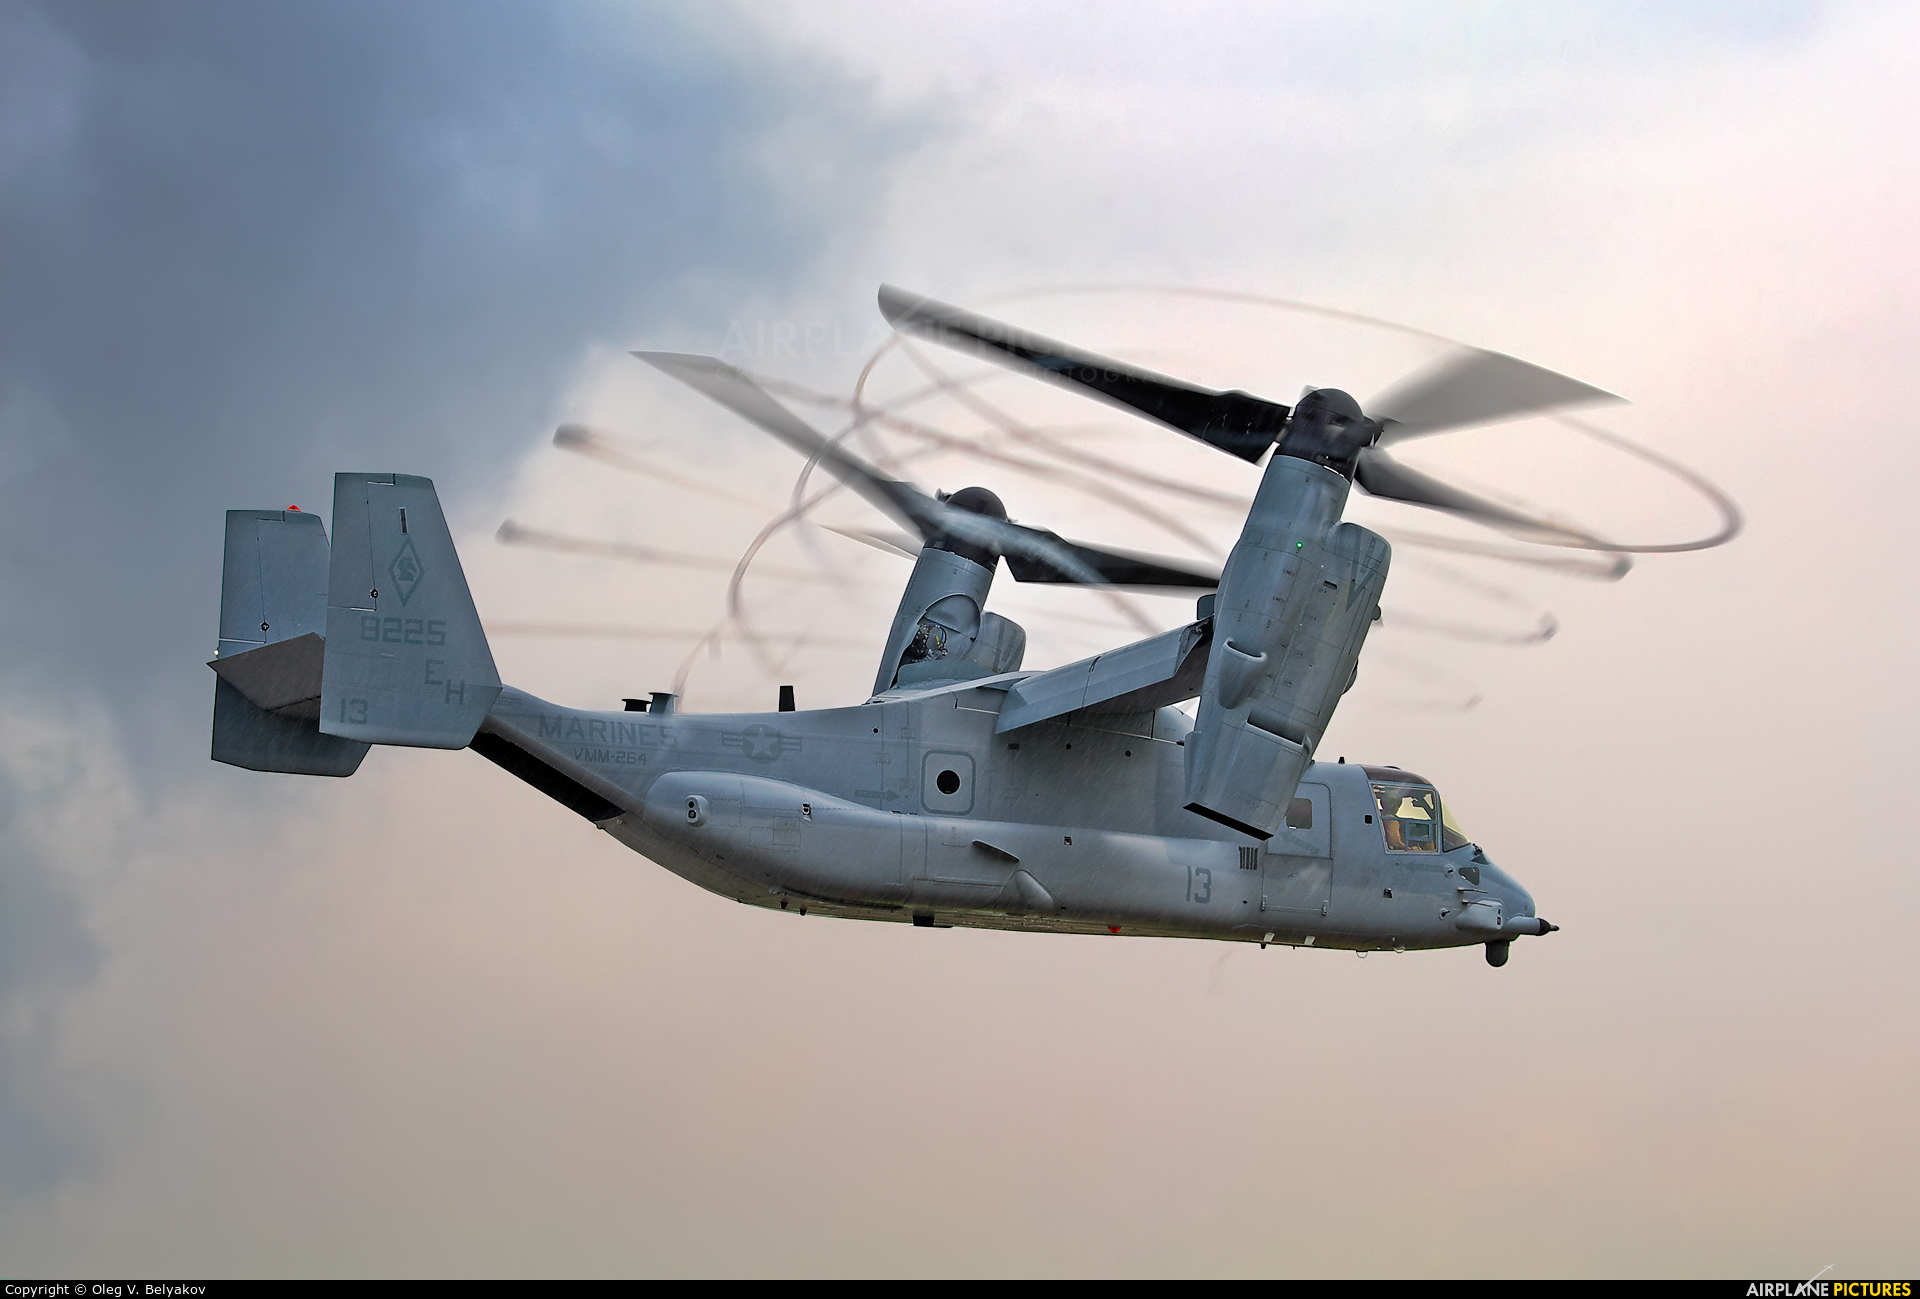 USA - Marine Corps 168225 aircraft at Fairford